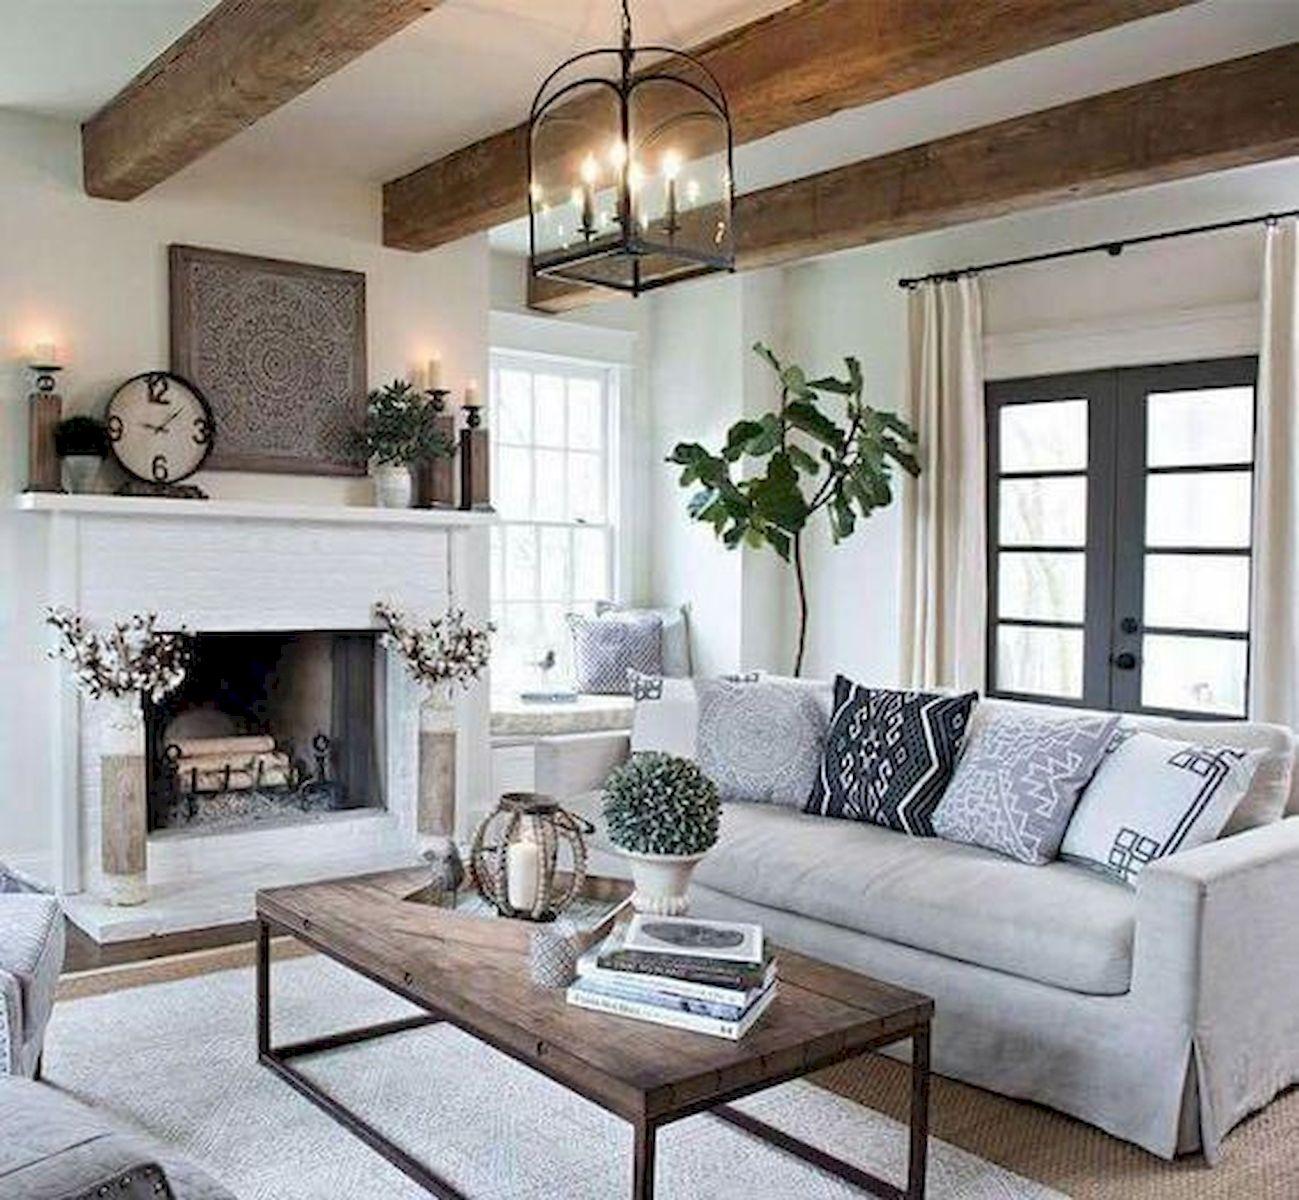 50 Gorgeous Living Room Decor and Design Ideas (8)